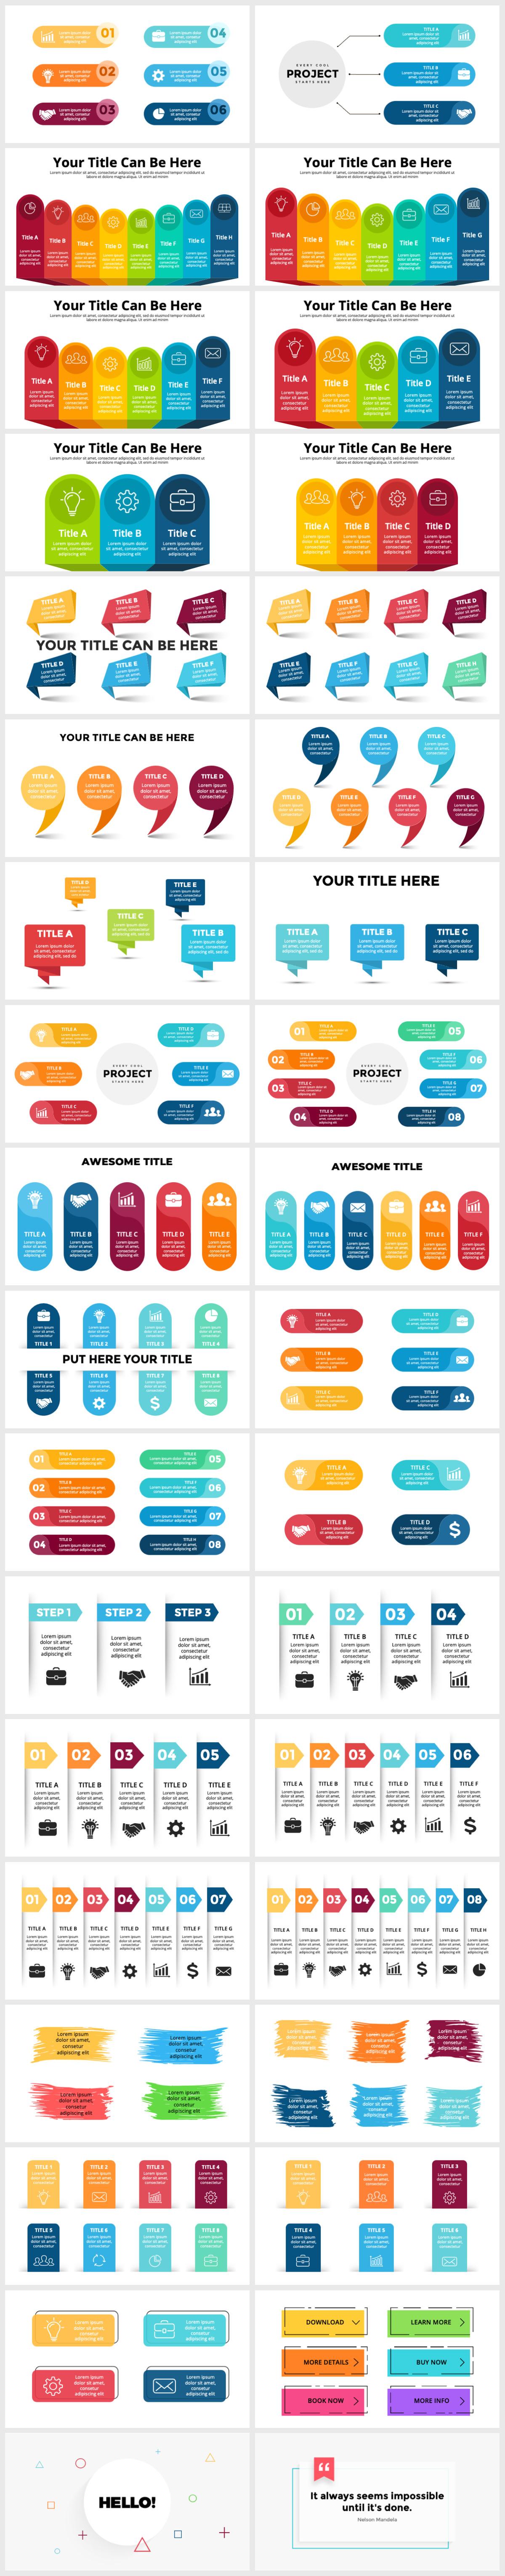 Huge Infographics Bundle! Lifetime Updates! PowerPoint, Photoshop, Illustrator. - 219